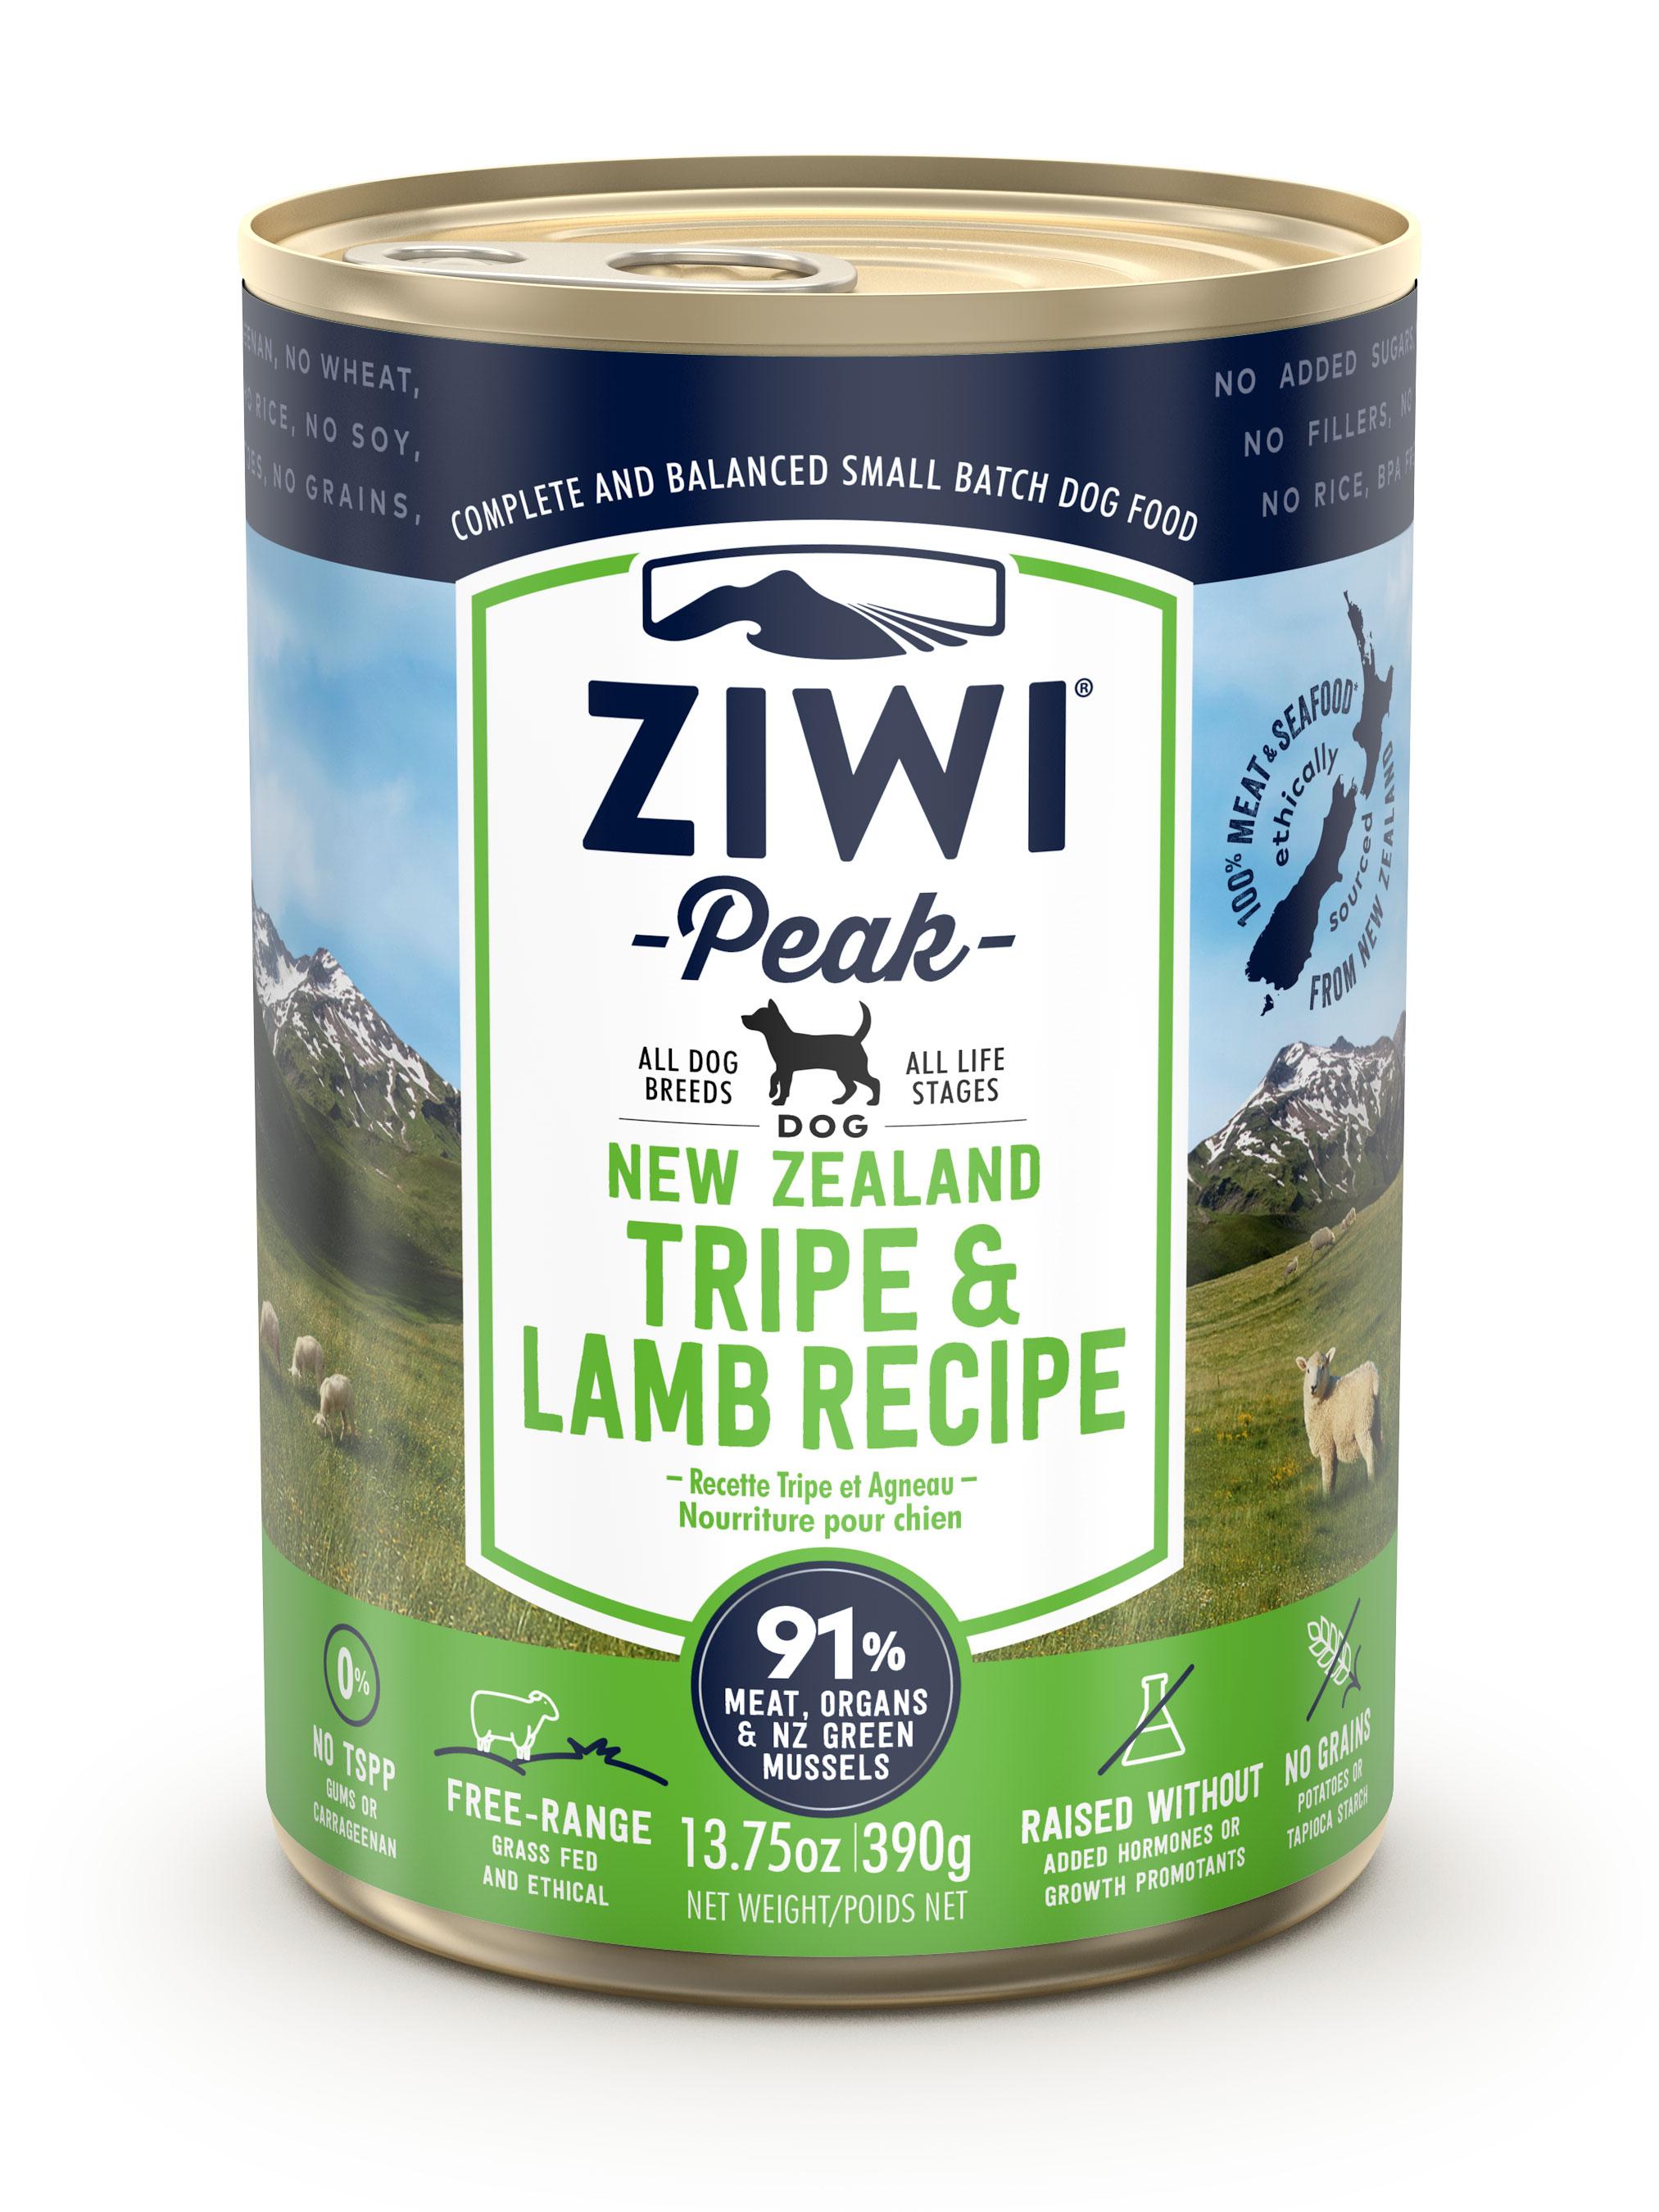 ZIWI Peak Canned Dog Food Tripe & Lamb, 13.75-oz|390-g